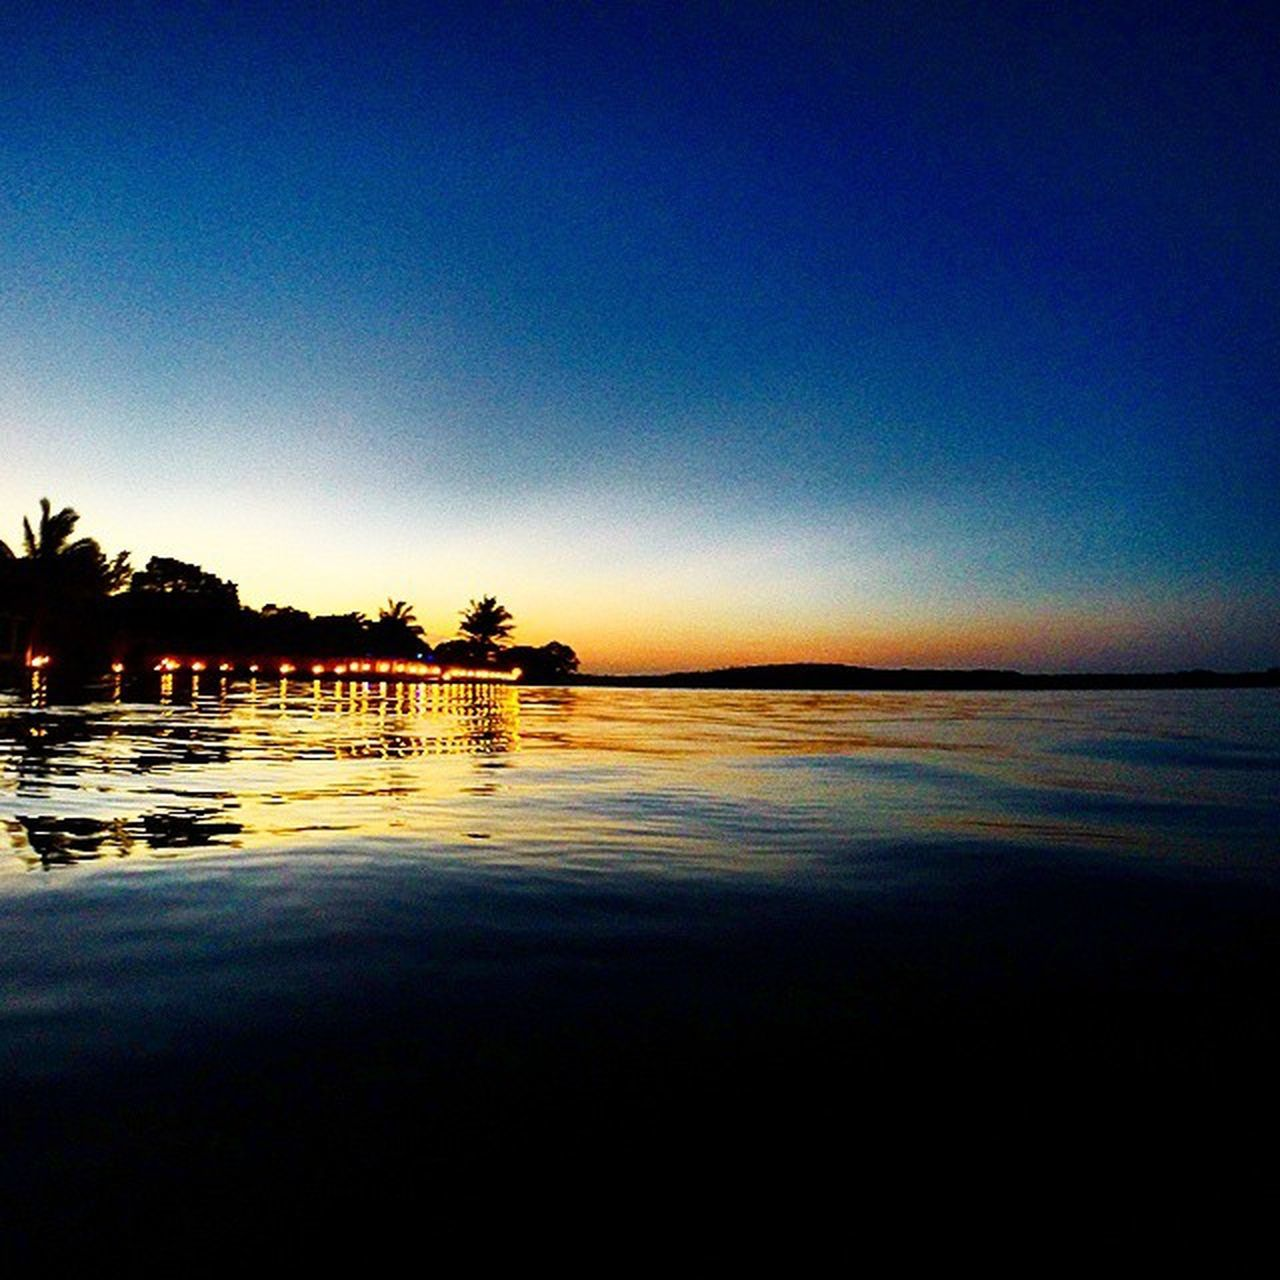 Sunset in Chidenguele Chidenguele Moçambique Gomozambique Deceptively Simple